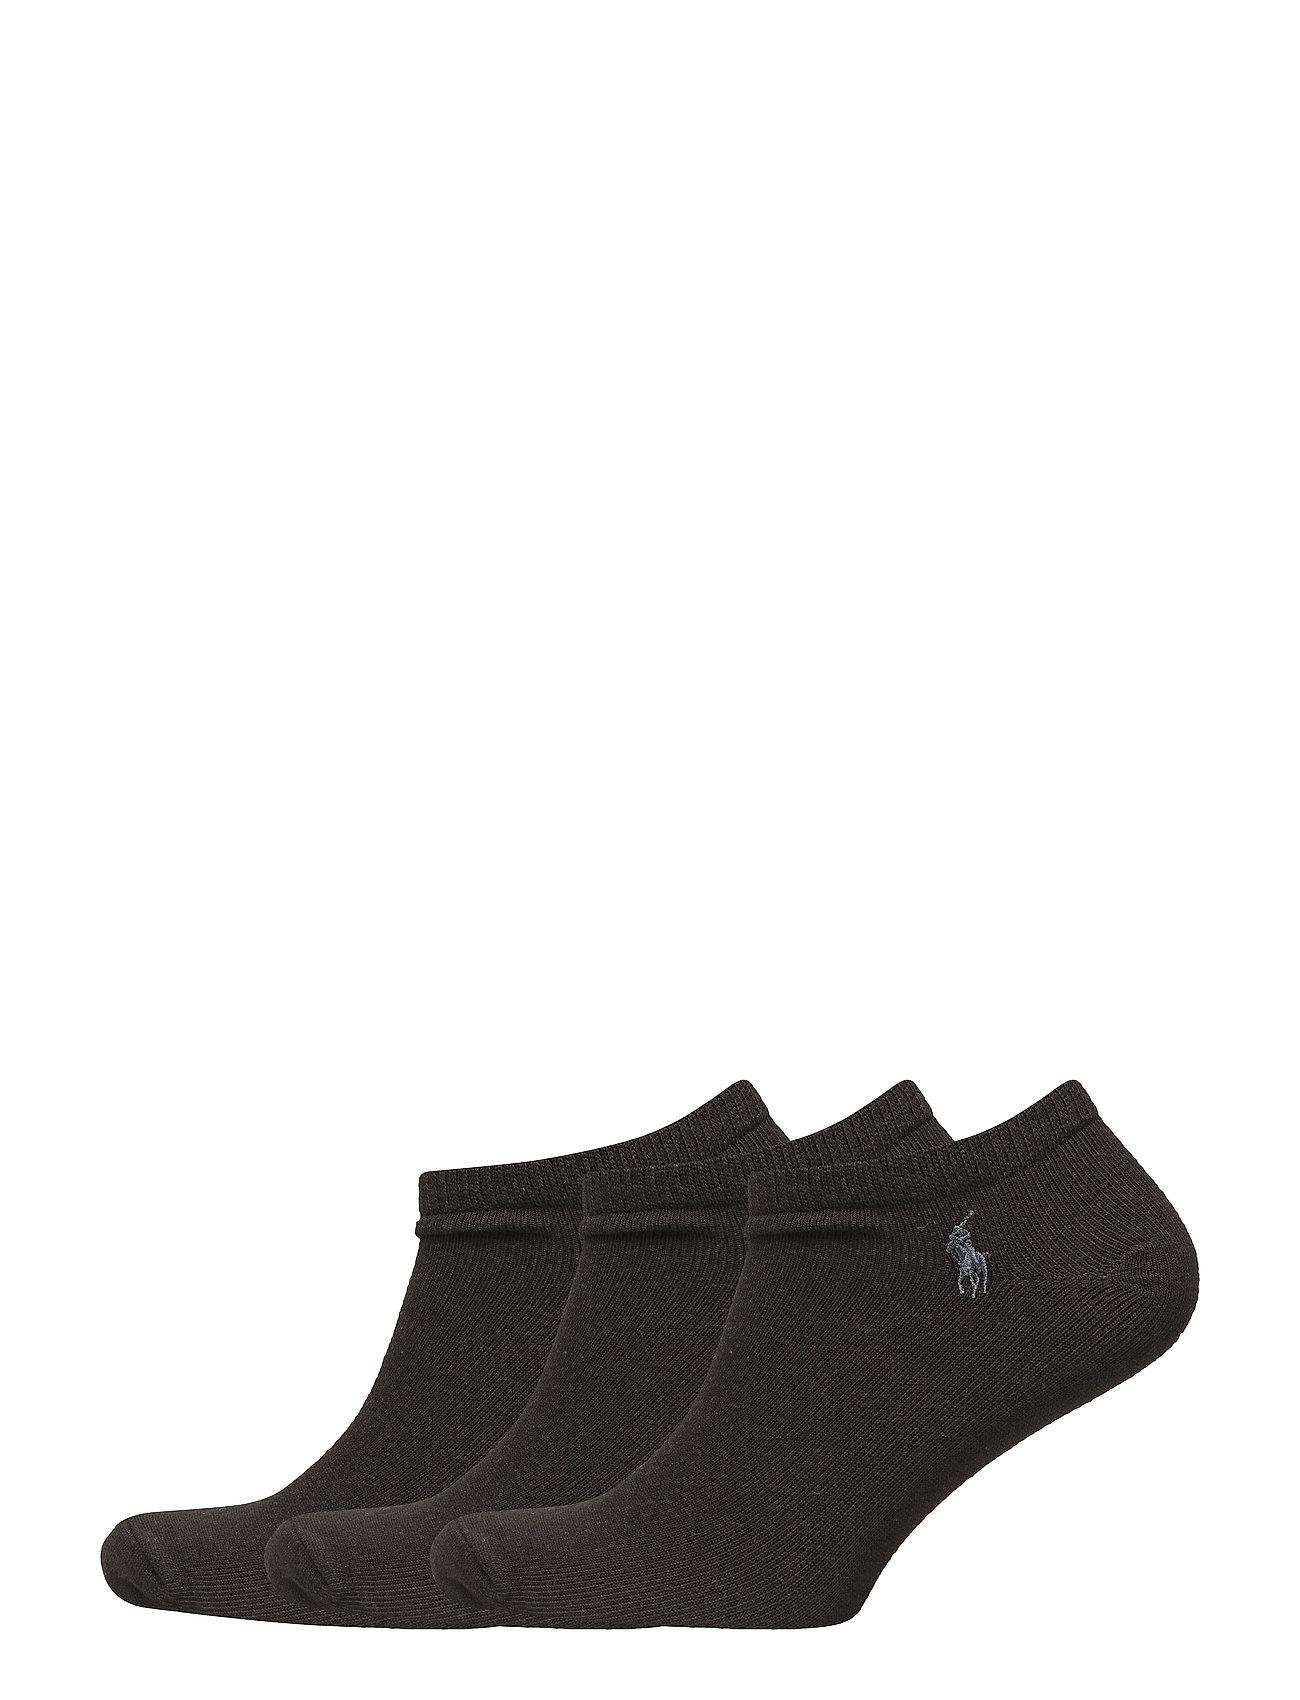 Polo Ralph Lauren Underwear GHOST PED PP-SOCKS-3 PACK - BLACK